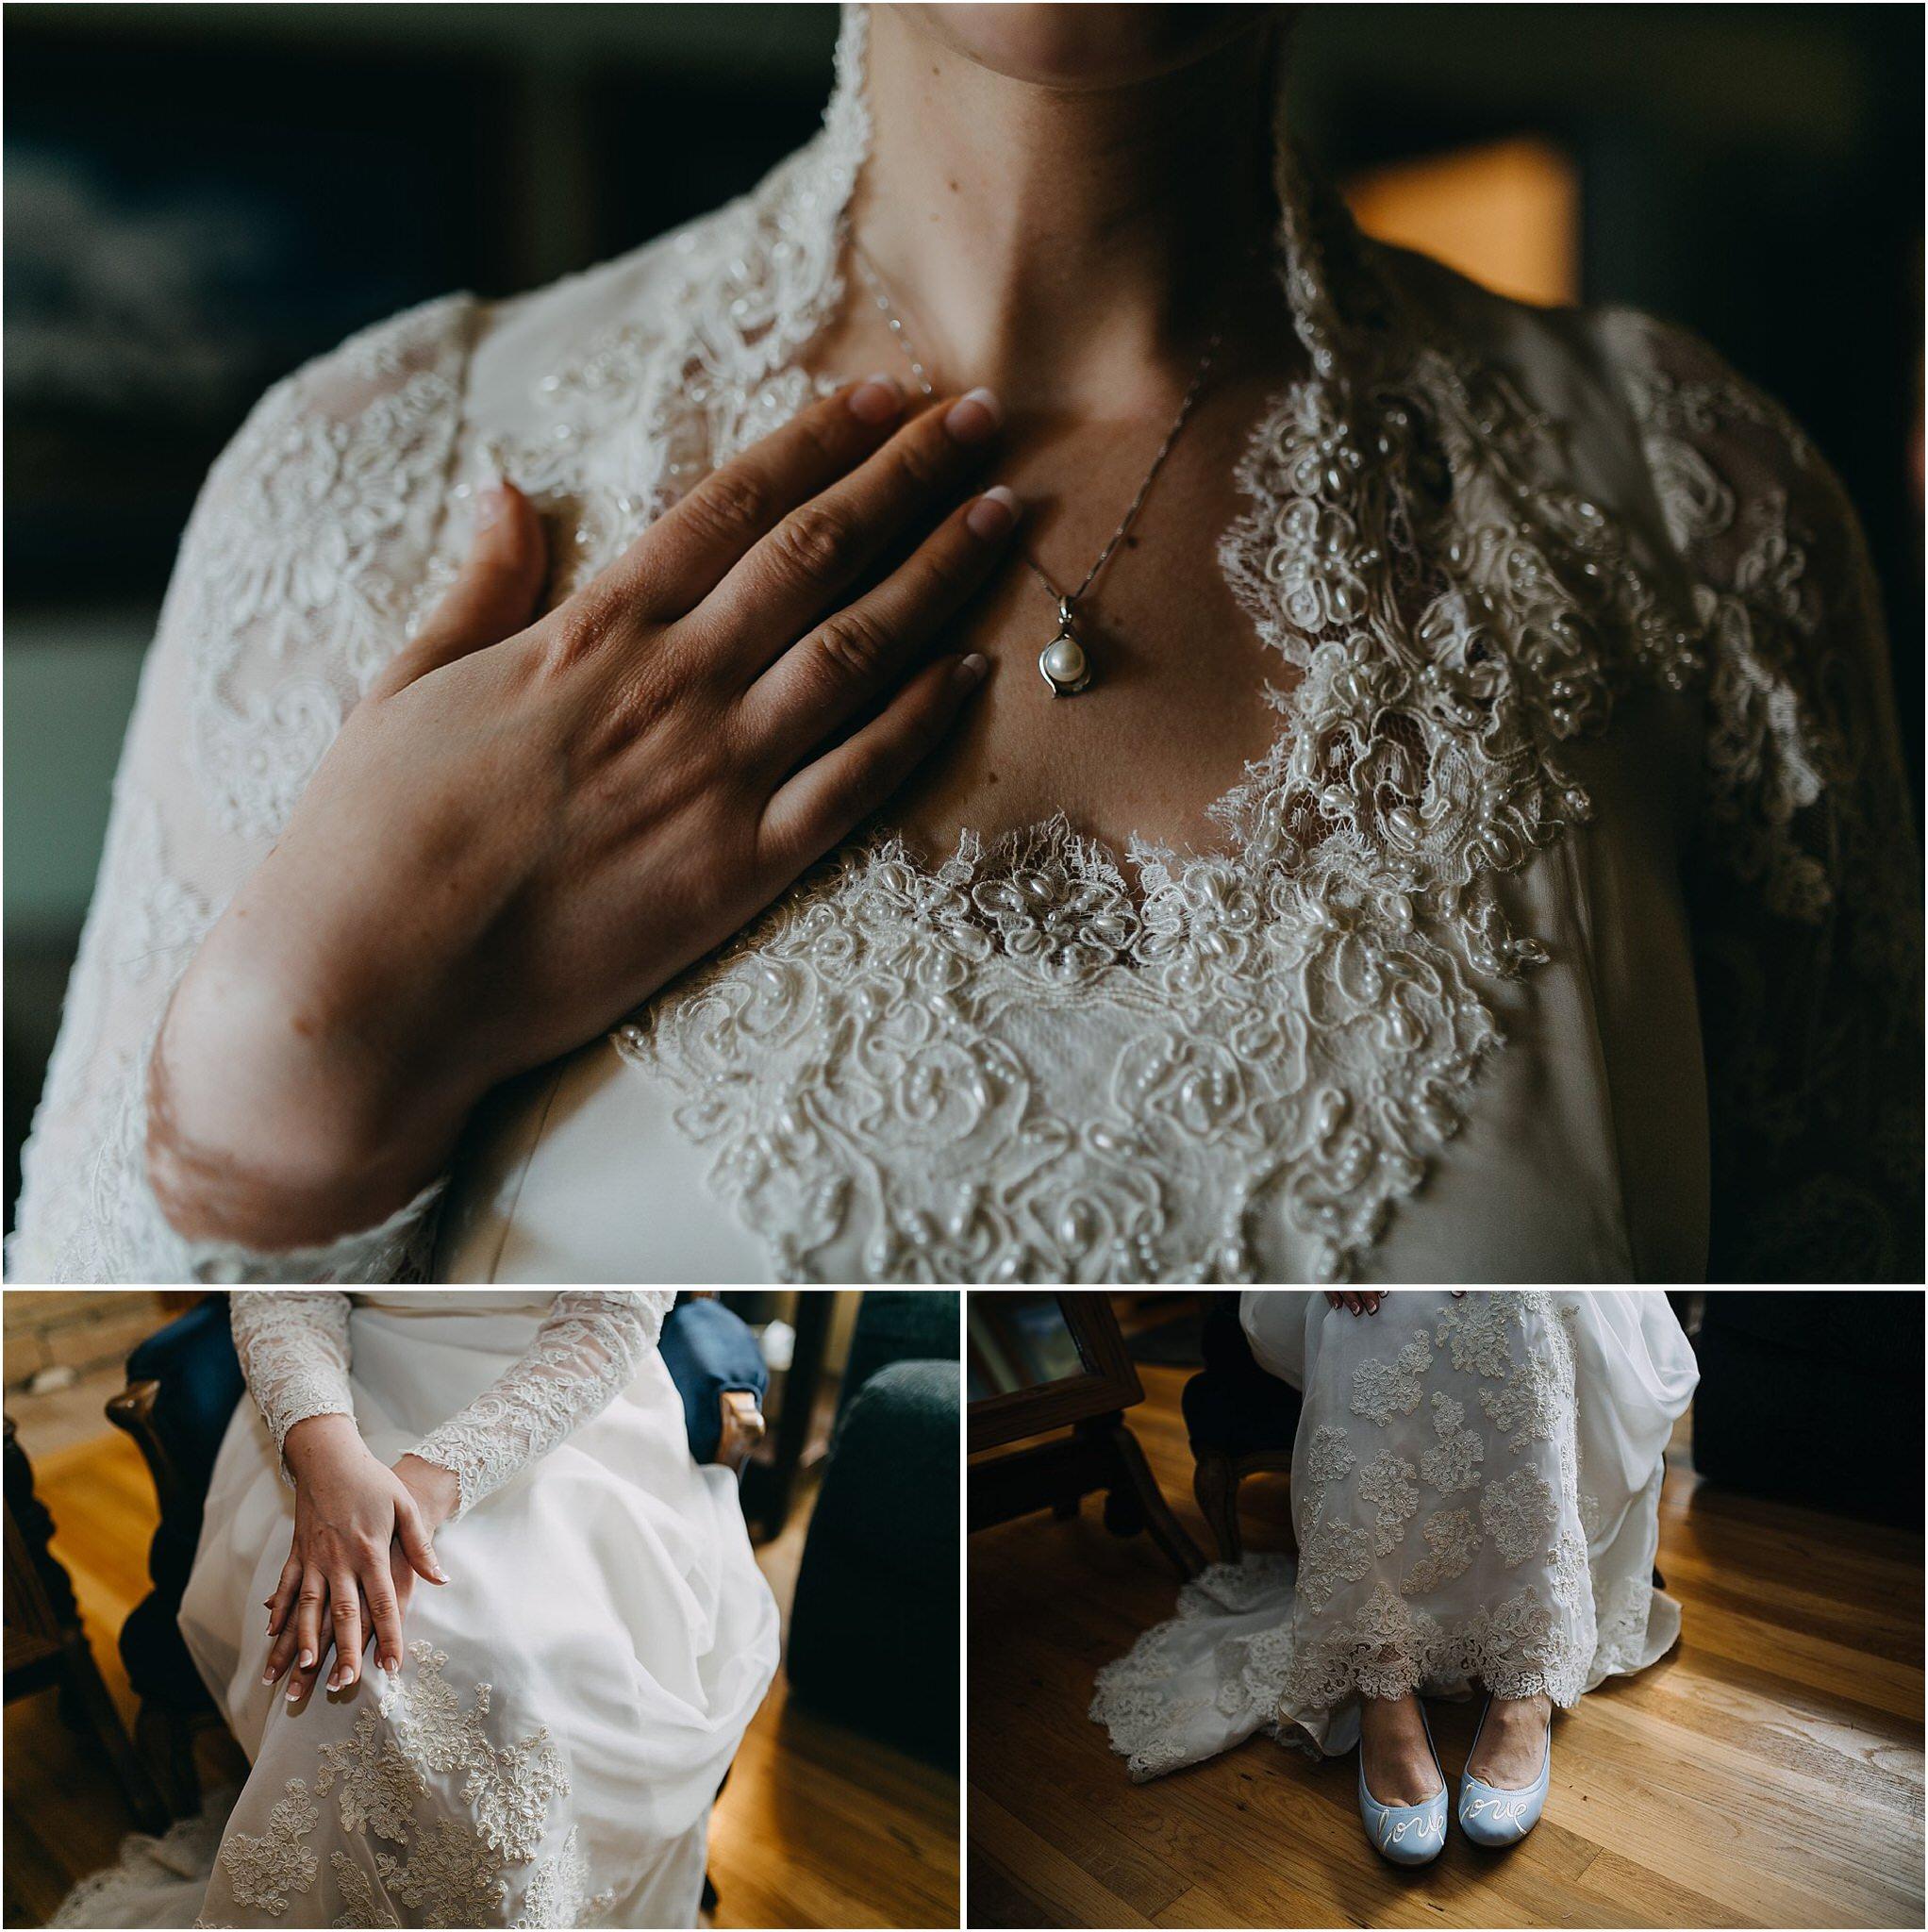 katy-robin-married-in-mukilteo-wedding9.jpg